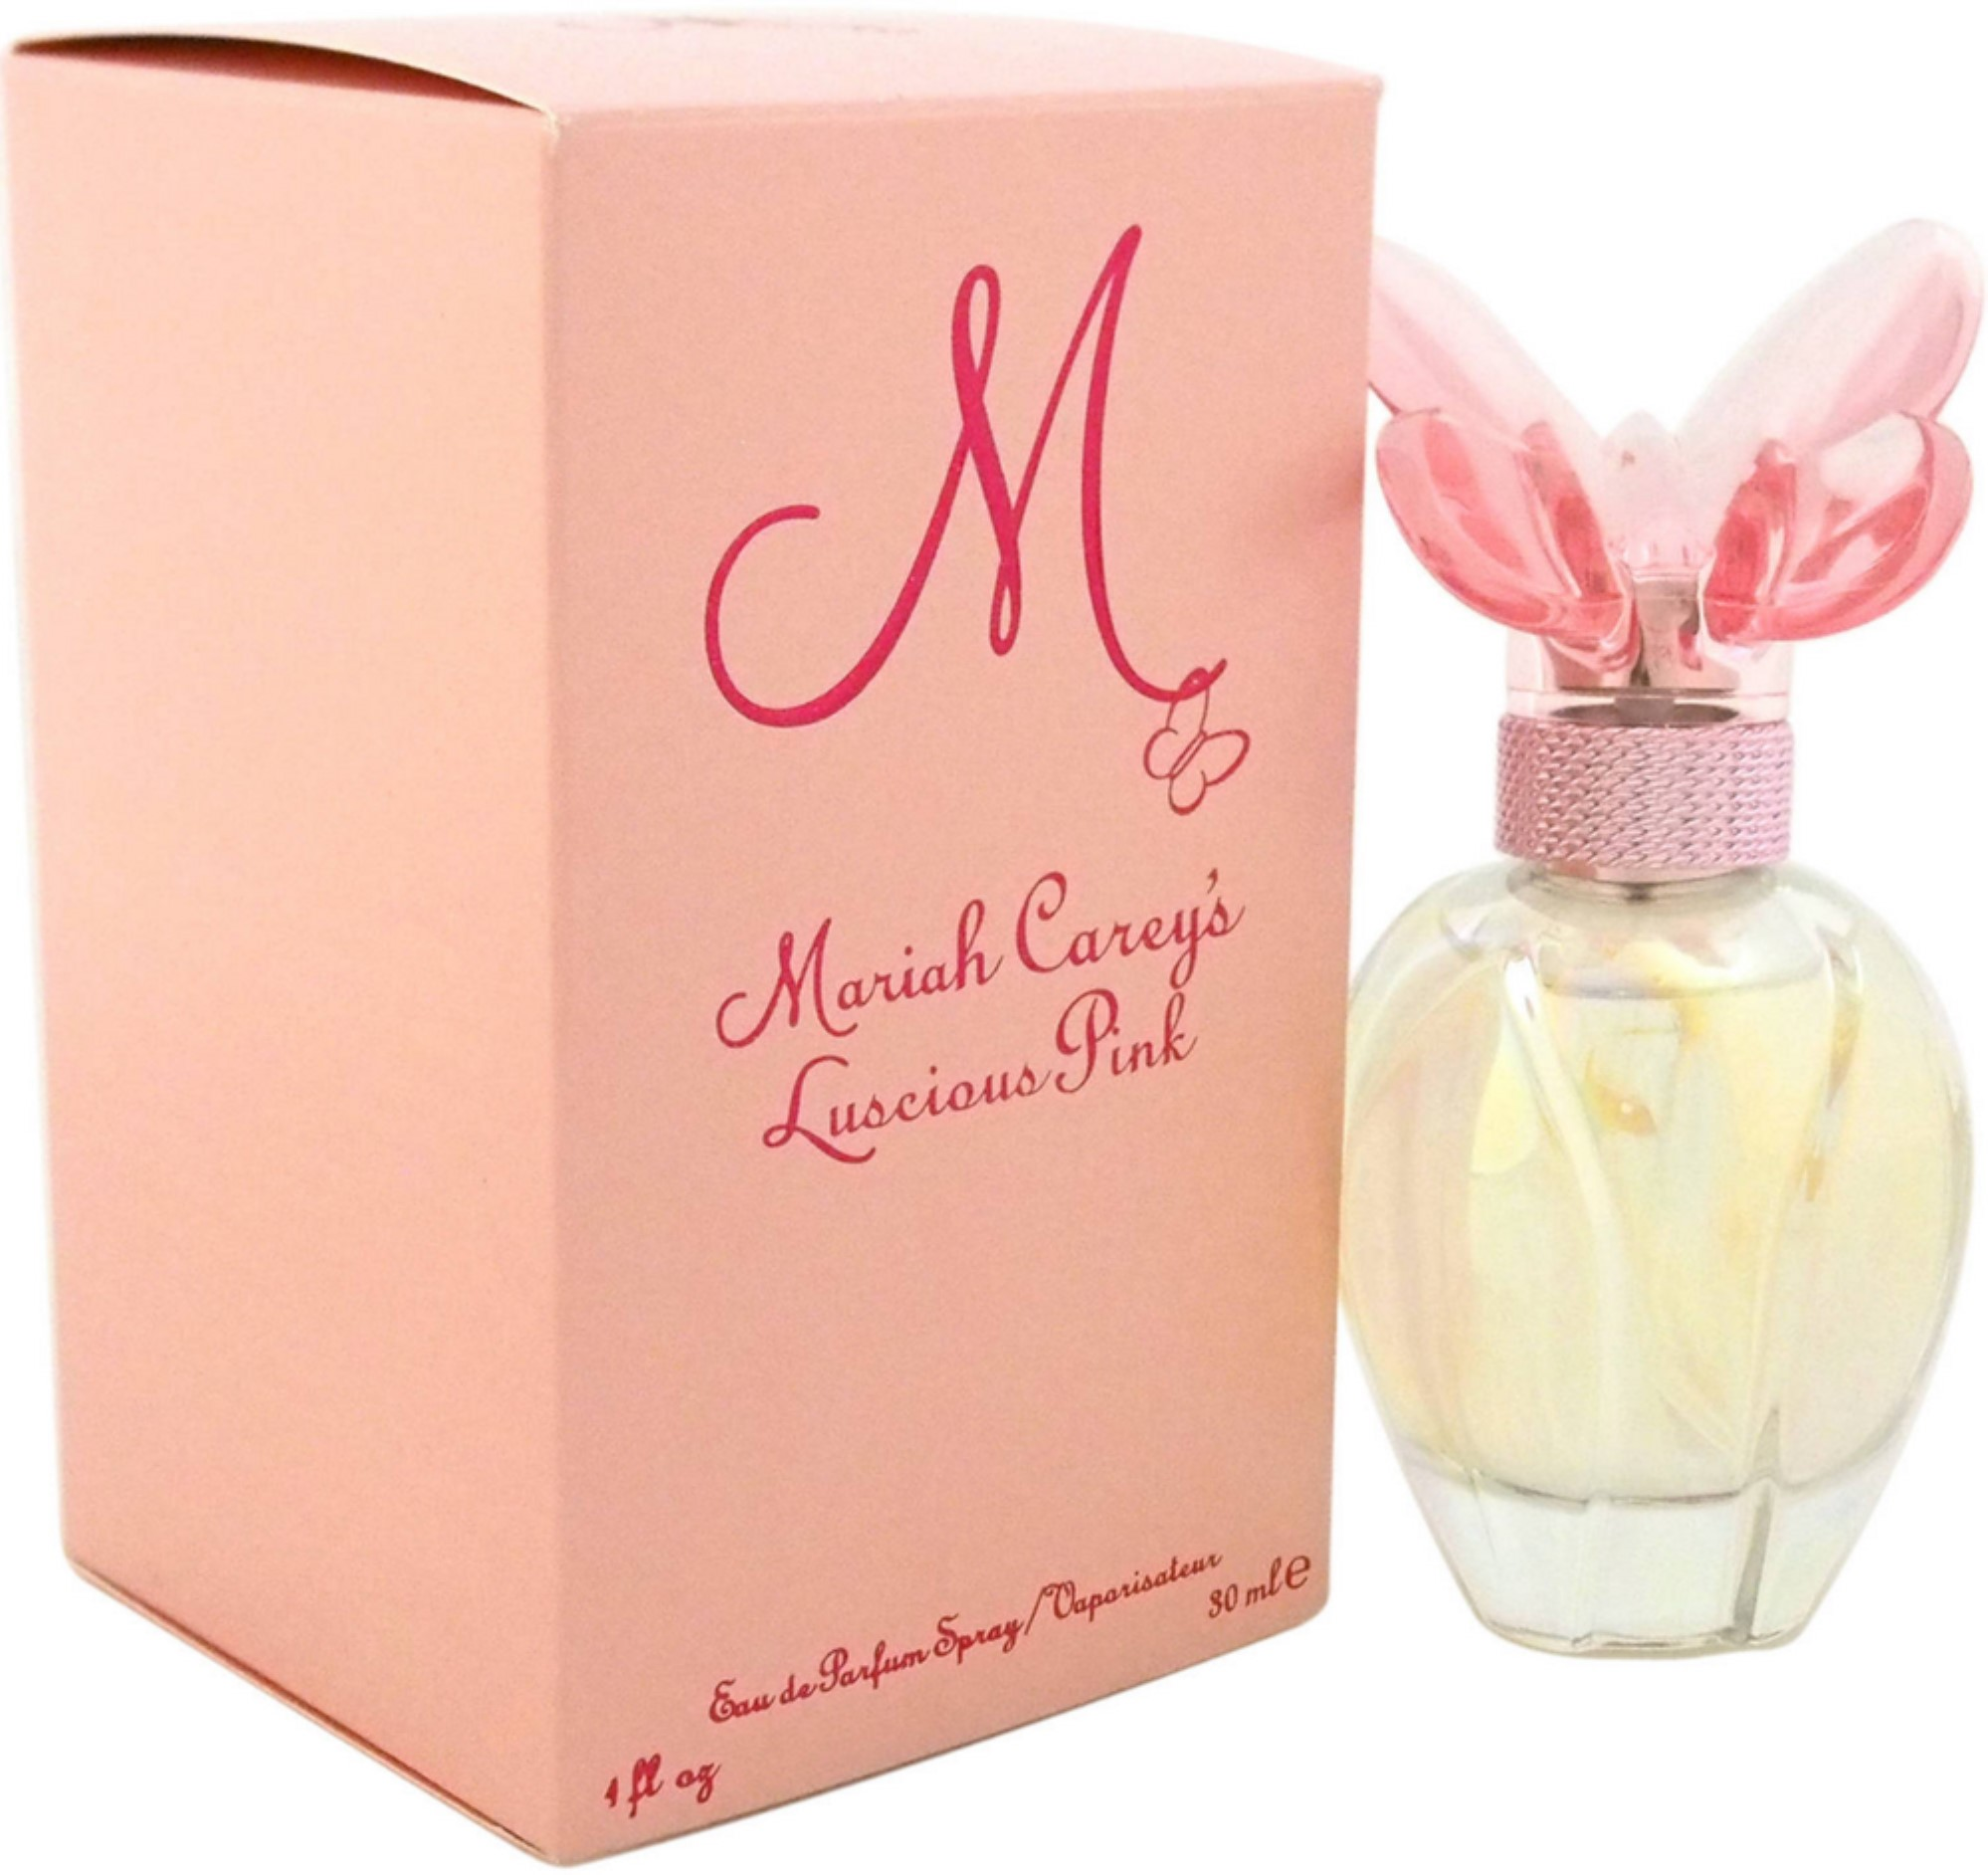 2 Pack - Luscious Pink By Mariah Carey Eau de Parfum Spray 1 oz